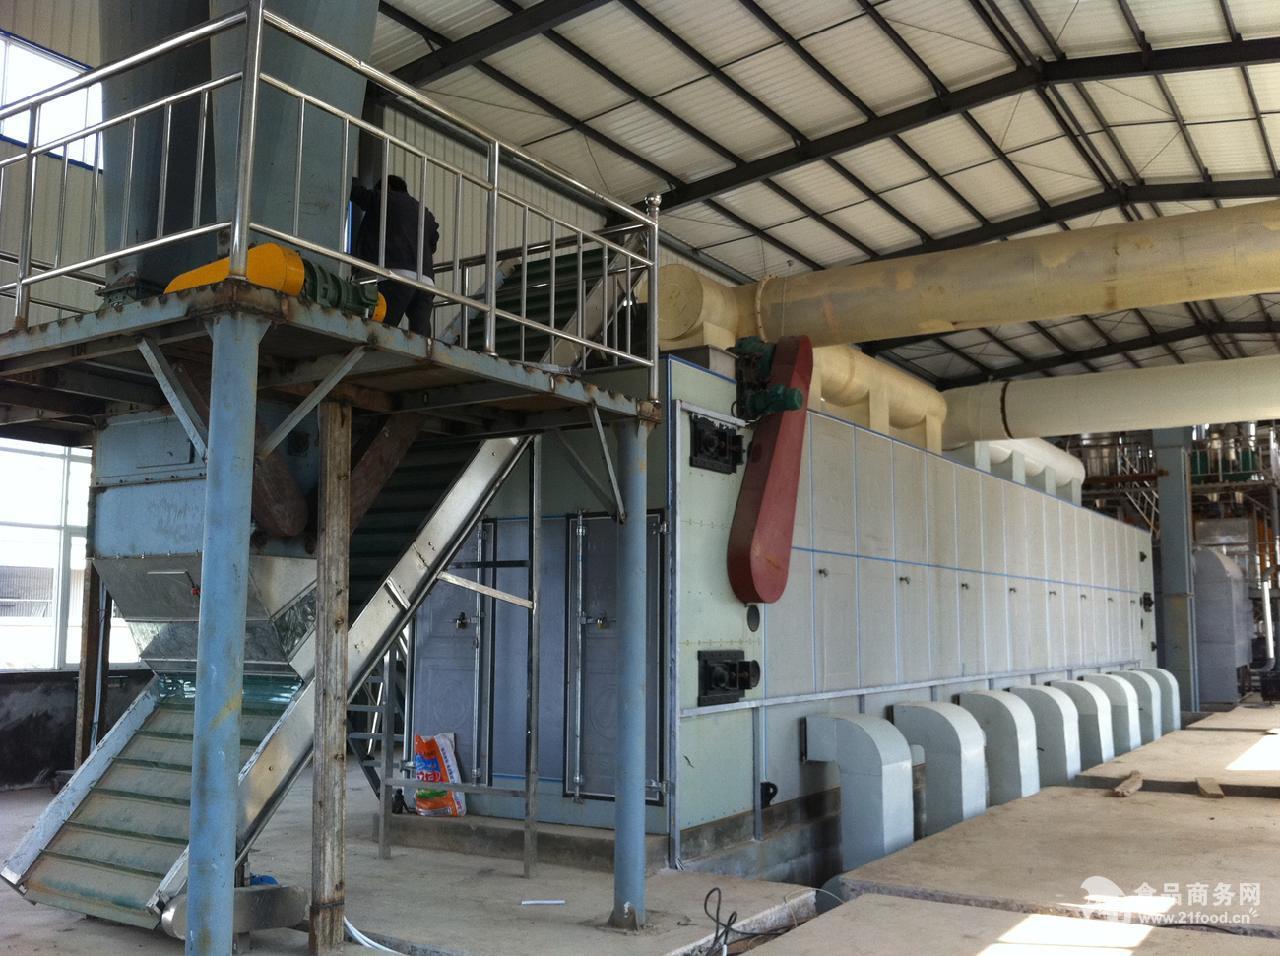 色素厂干燥机 饲料厂干燥机 食品厂干燥机